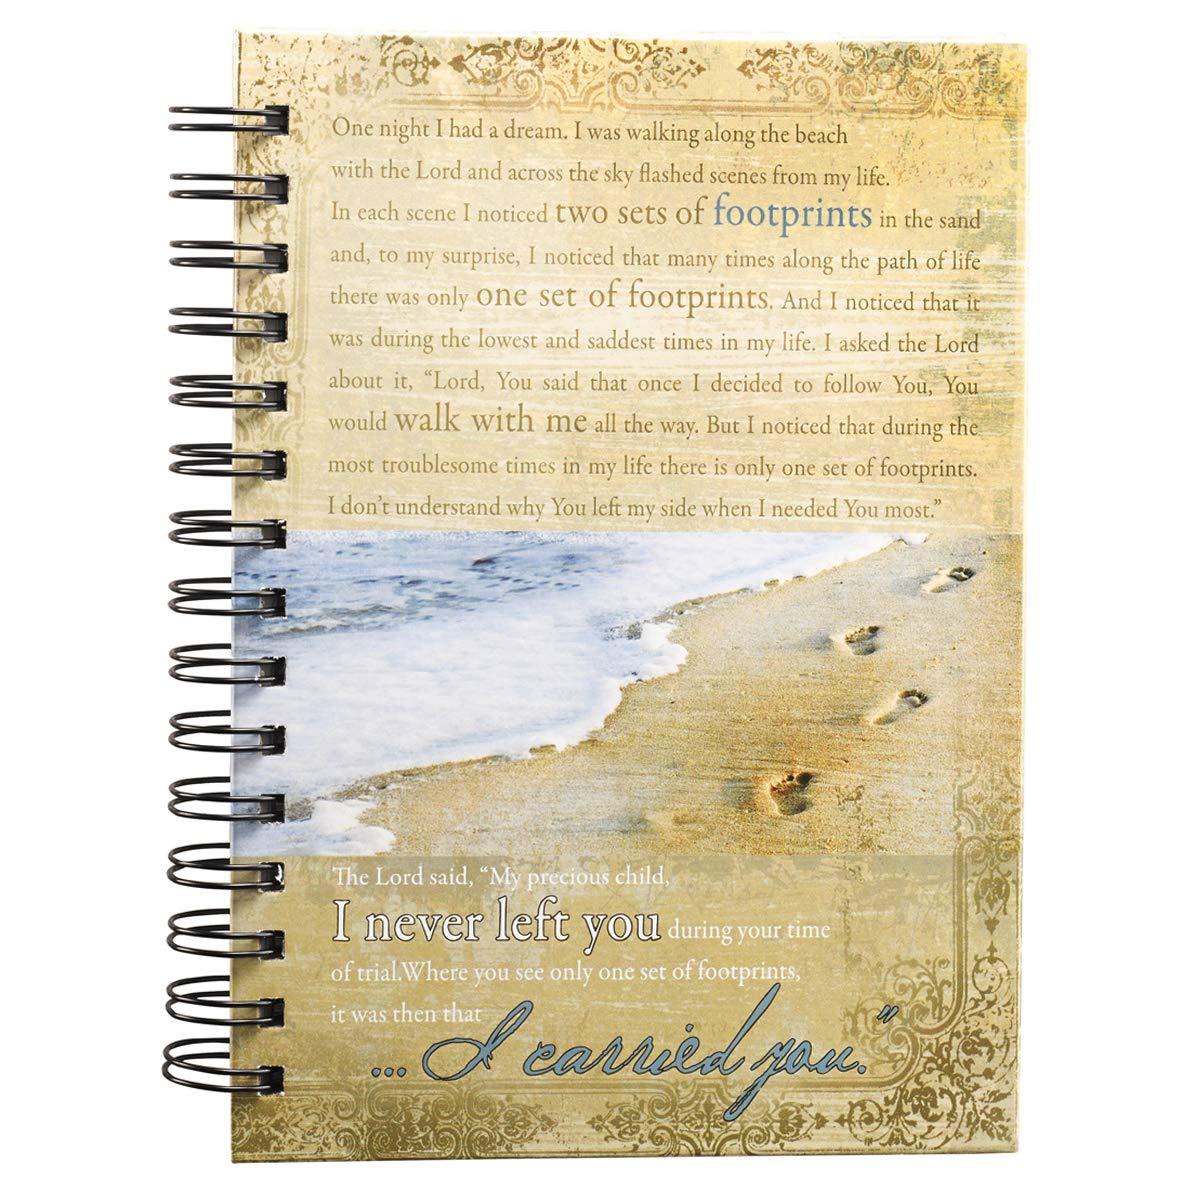 Footprints Wirebound Journal Spiral-bound – Aug 1 2009 Christian Art Gifts 1770362533 Non-Classifiable Blank Books/Journals